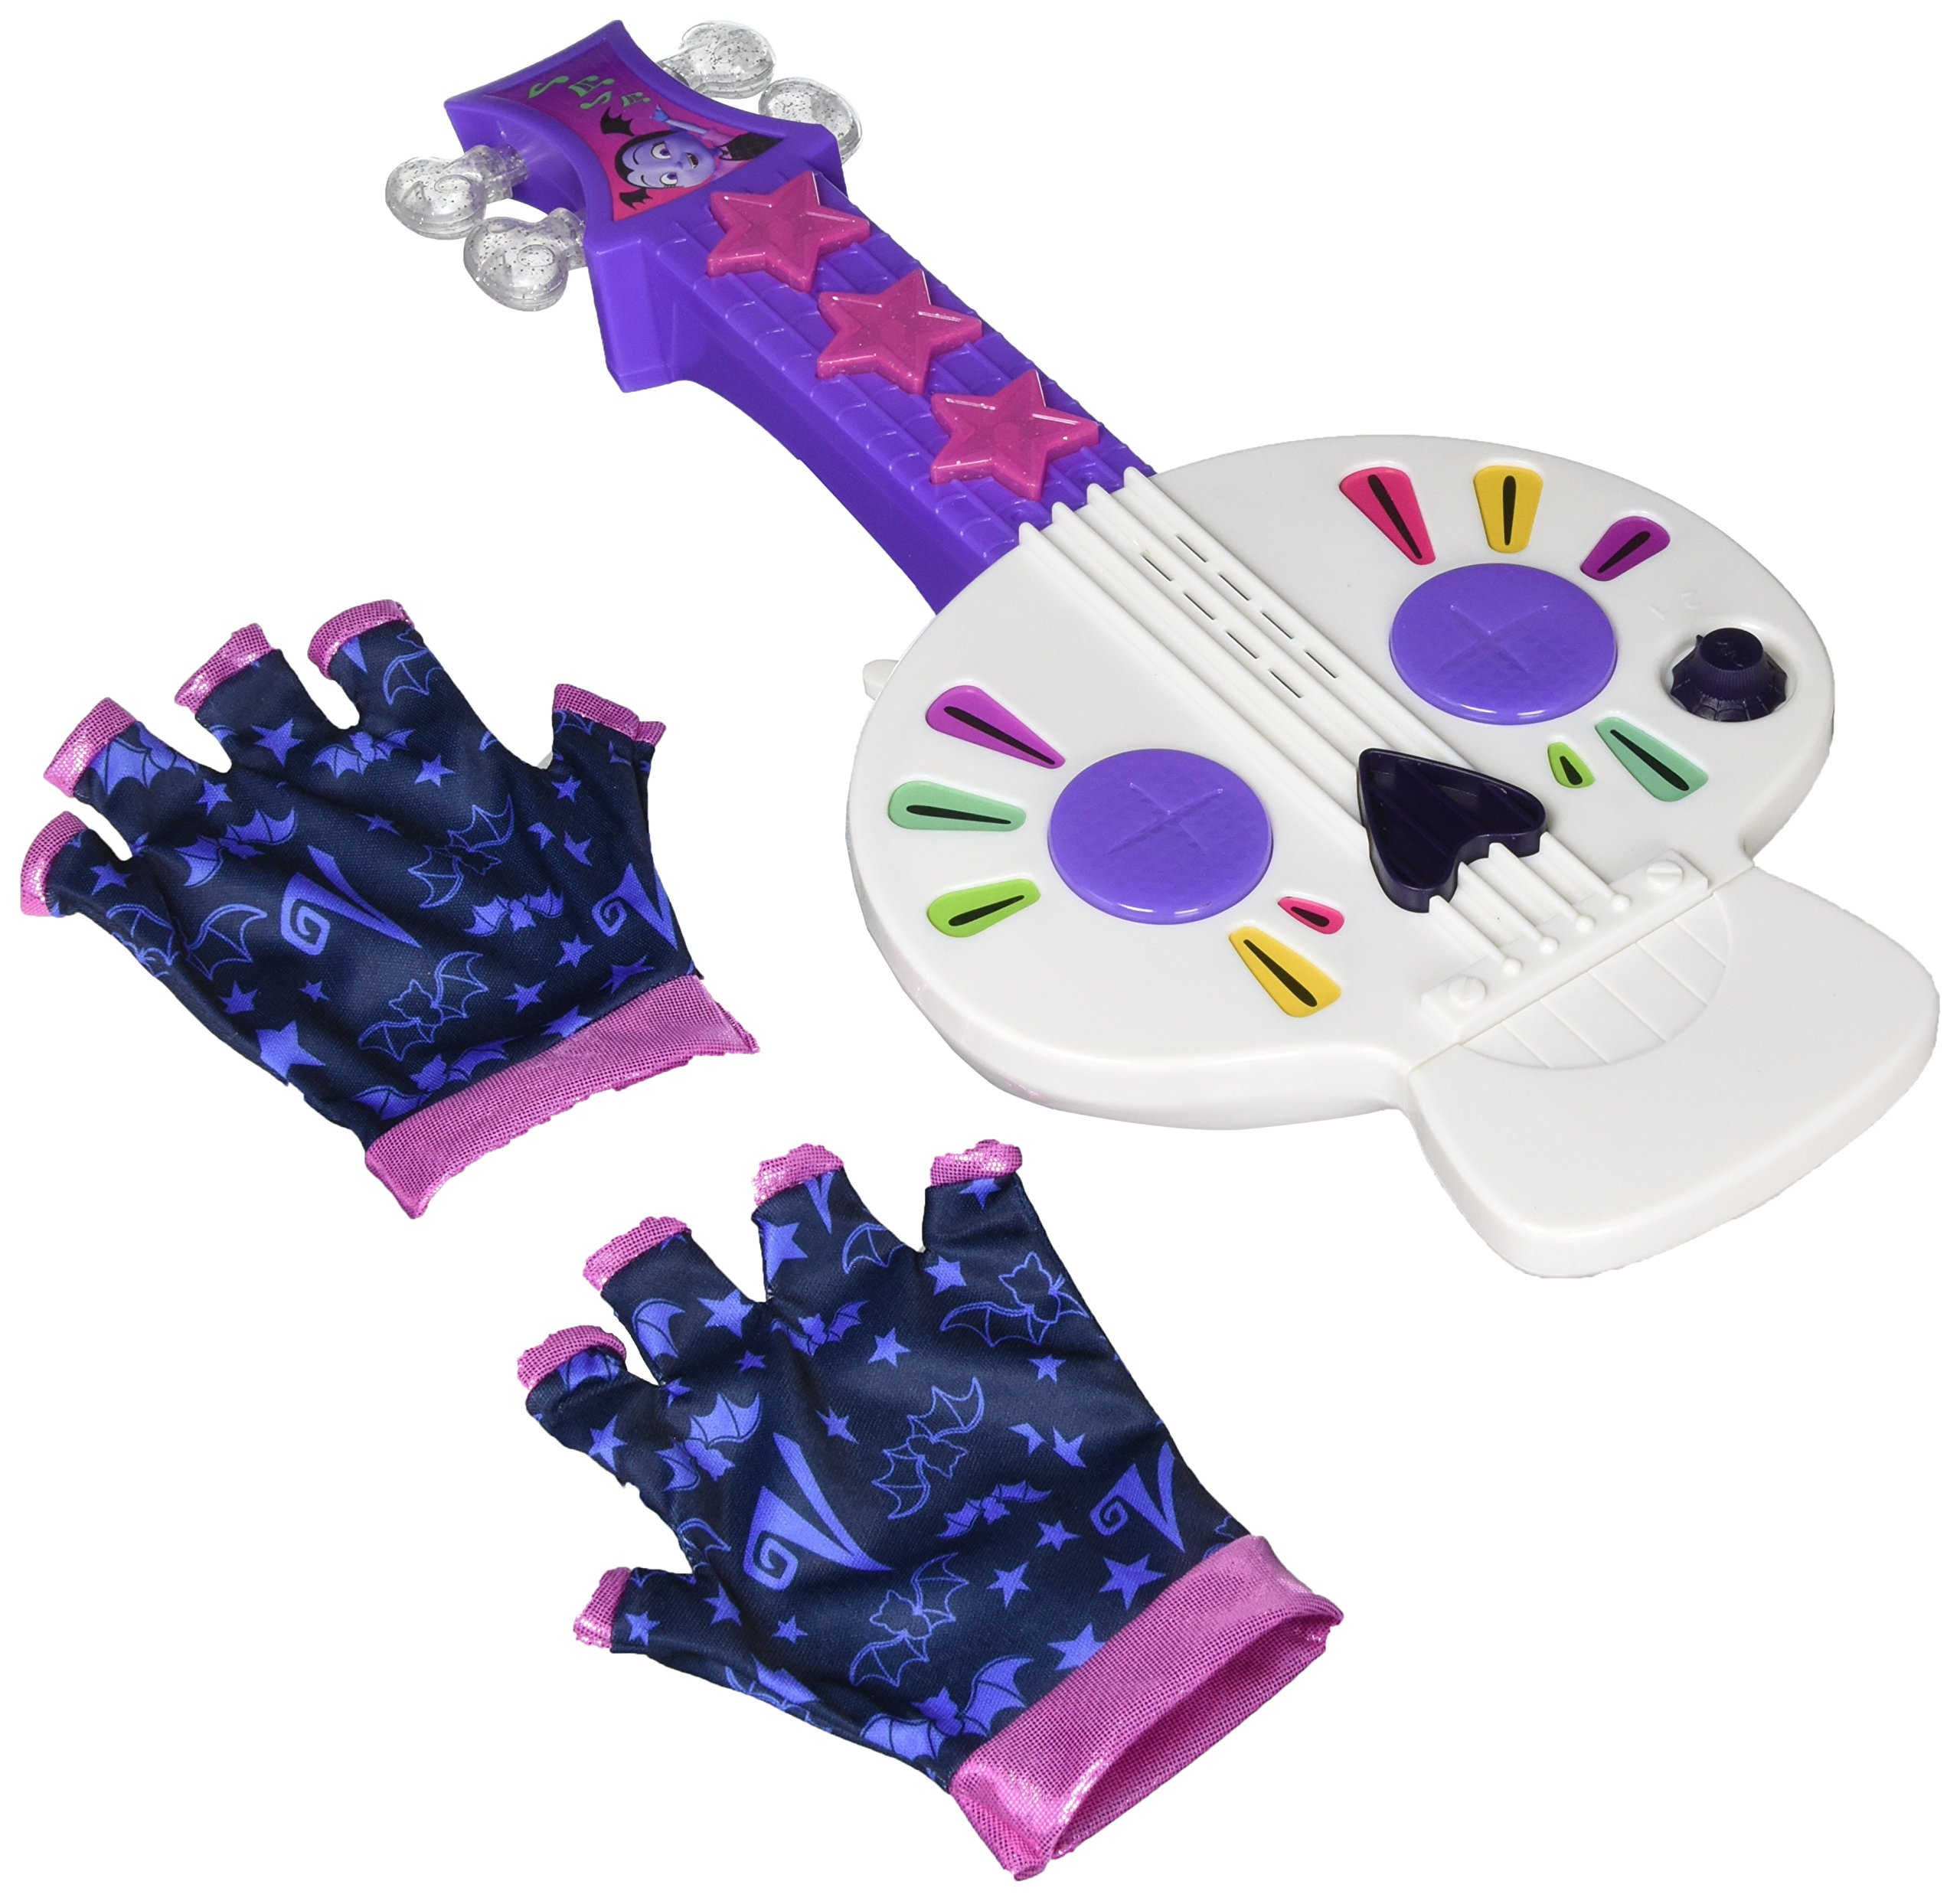 Vampirina Spooktastic Spookylele with Gloves by Vampirina